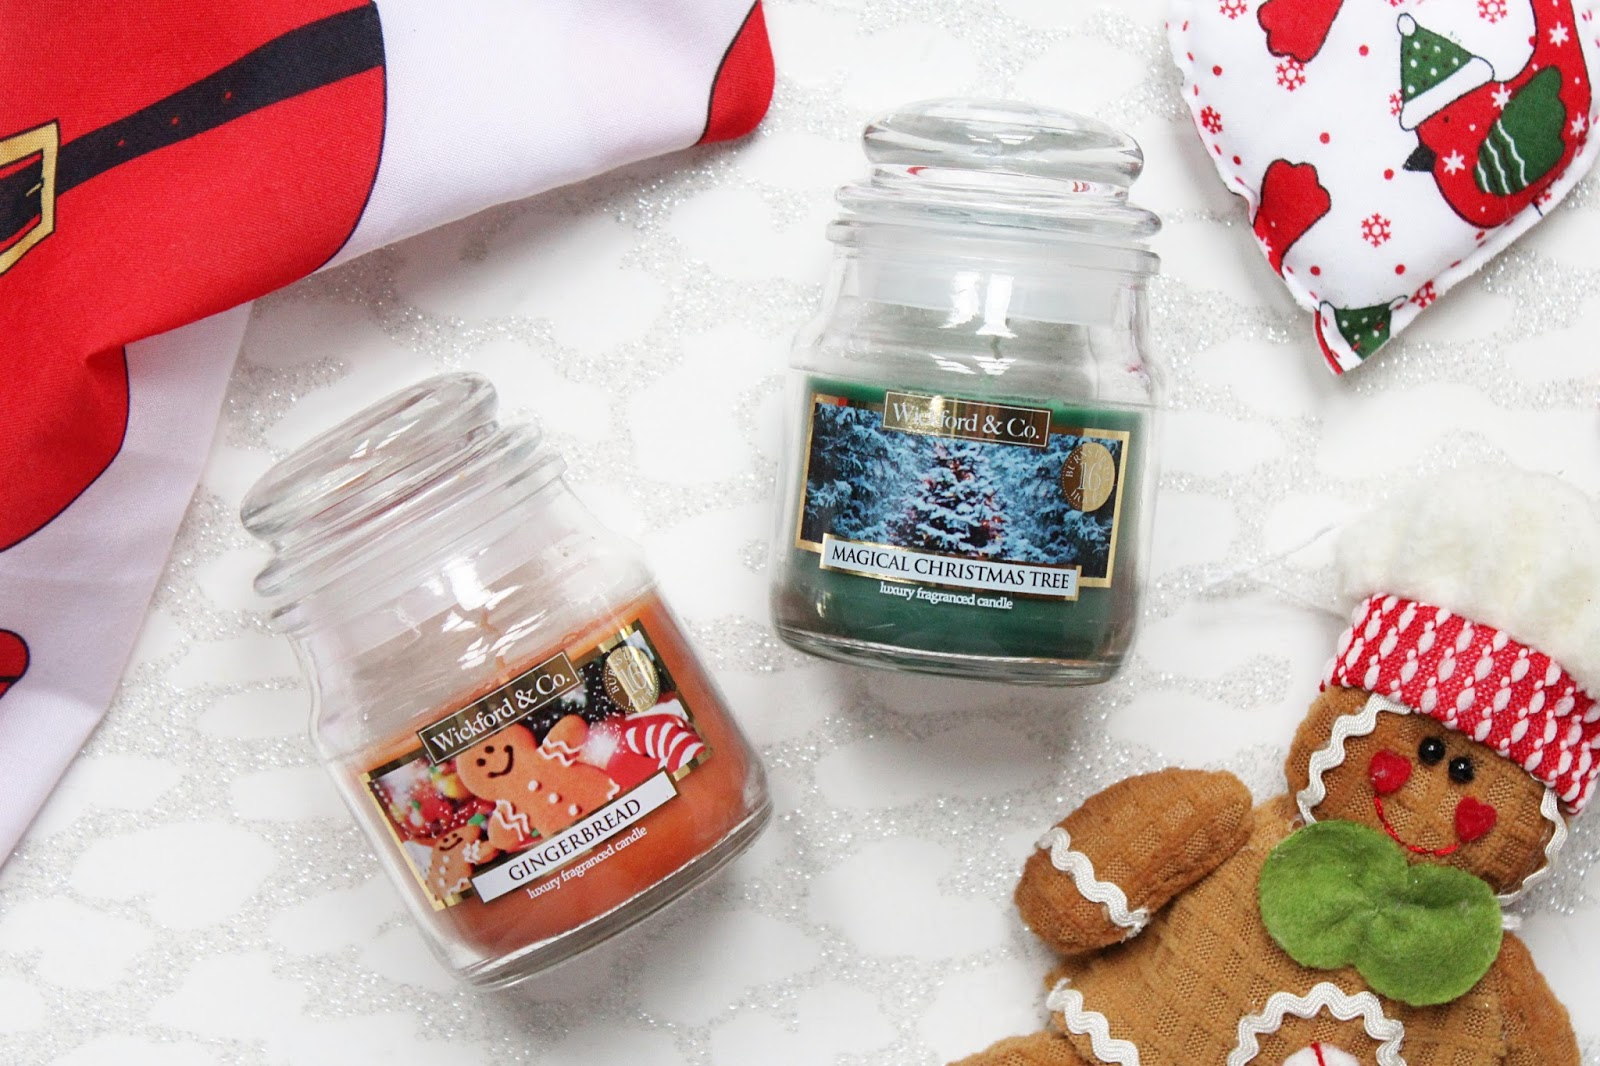 59p Christmas Candles